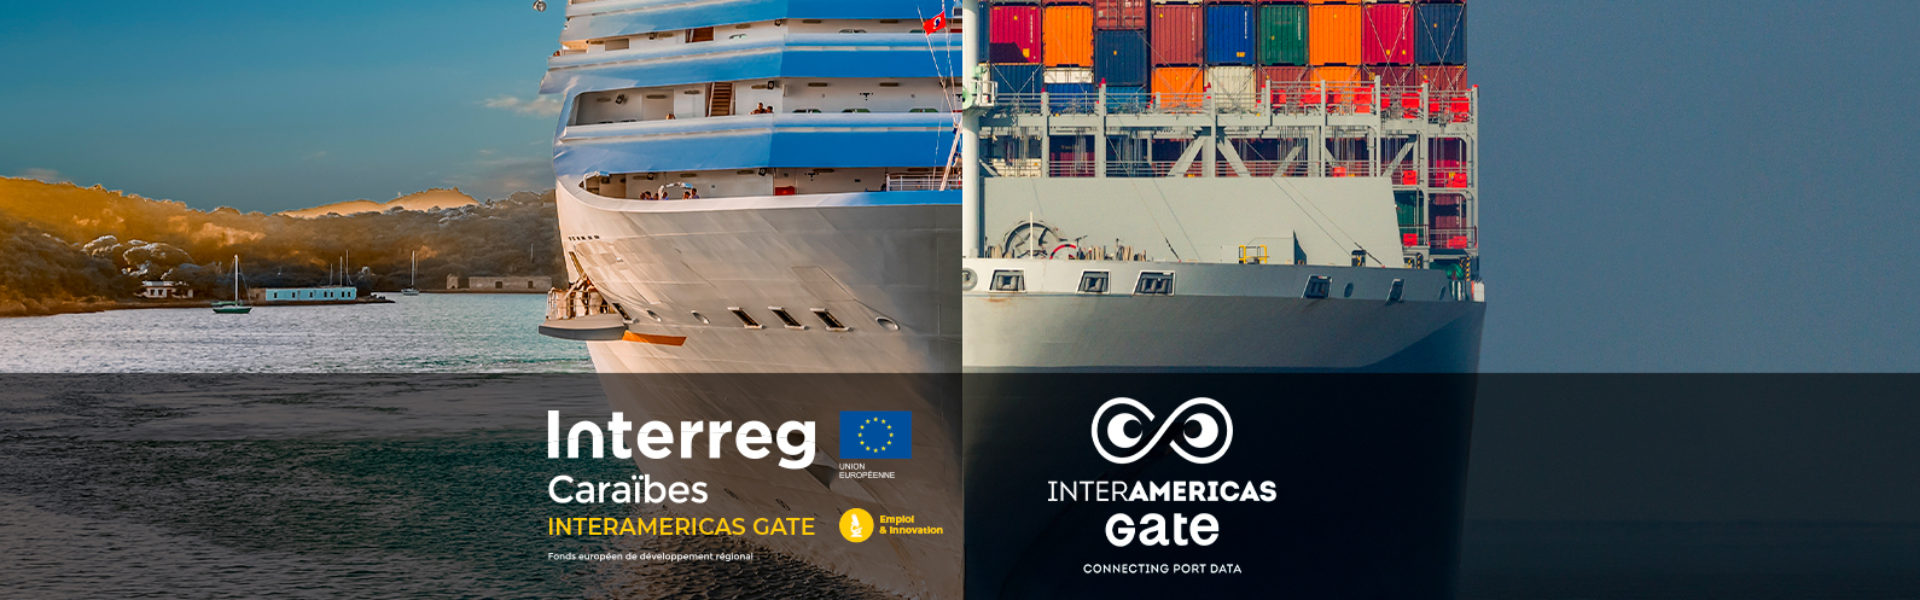 Interamericas gate - Le blog